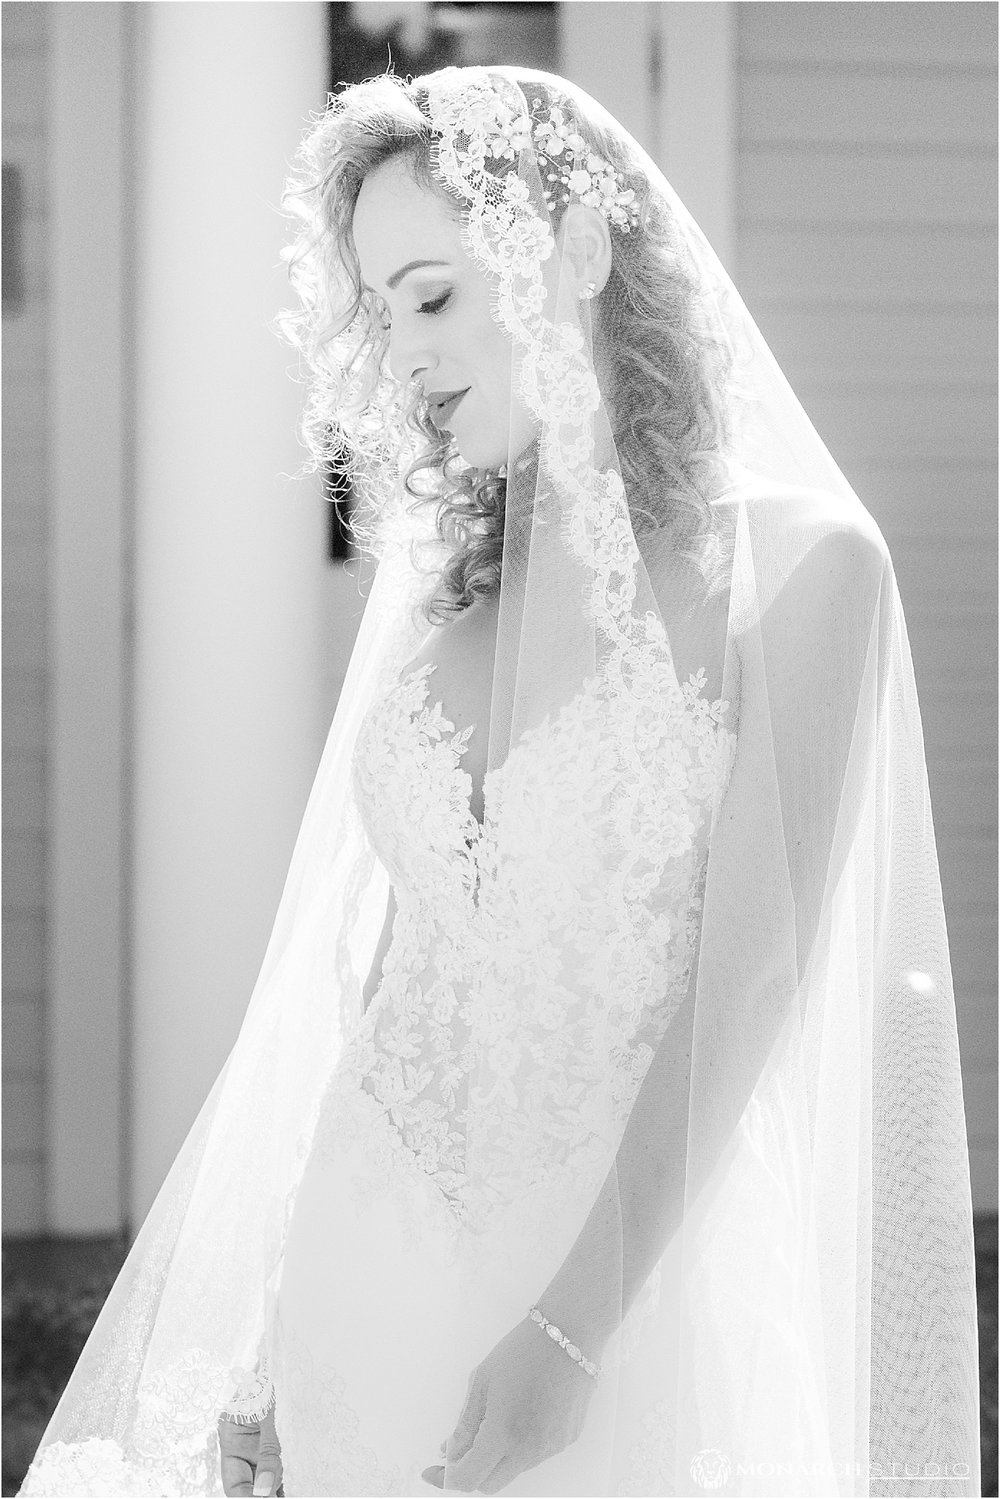 The-Whiteroom-Wedding-Photography-Saint-Augustine-Florida (22).jpg